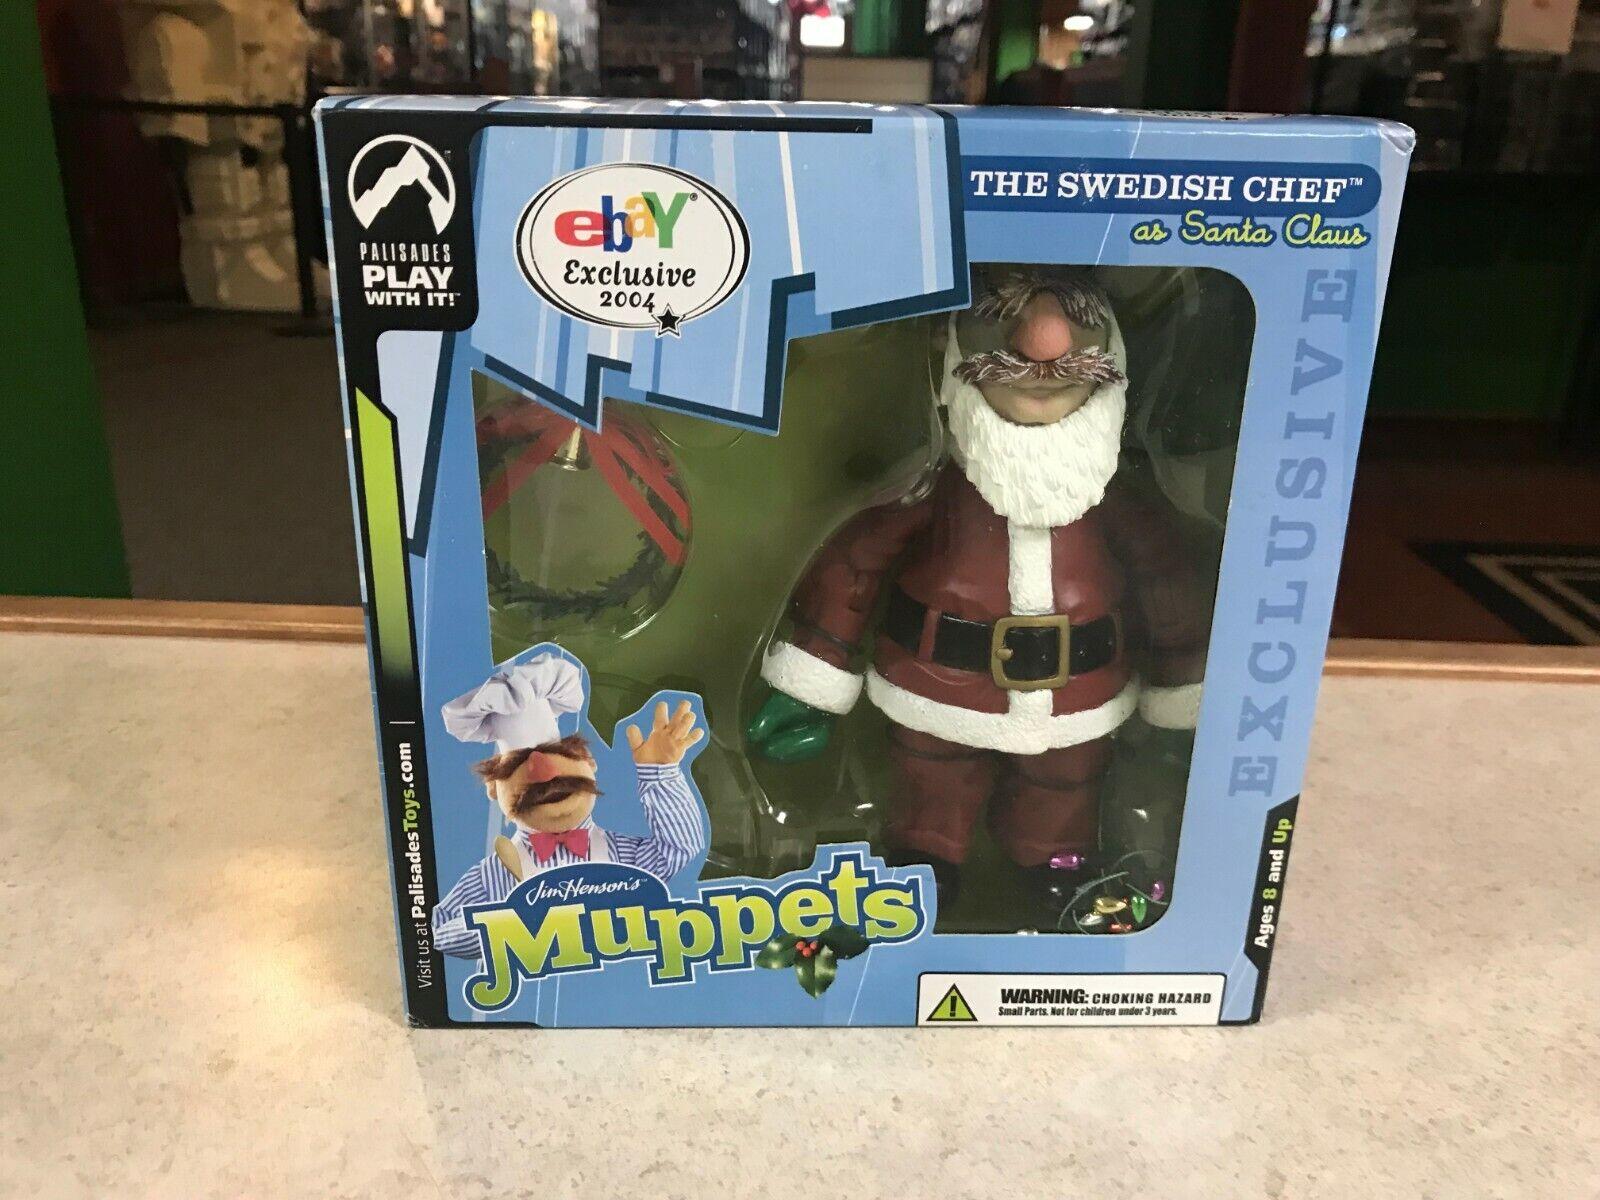 2004 Palisades The Muppet Show SWEDISH CHEF CHEF CHEF as SANTA CLAUS Ebay Only Figure NIB da39eb